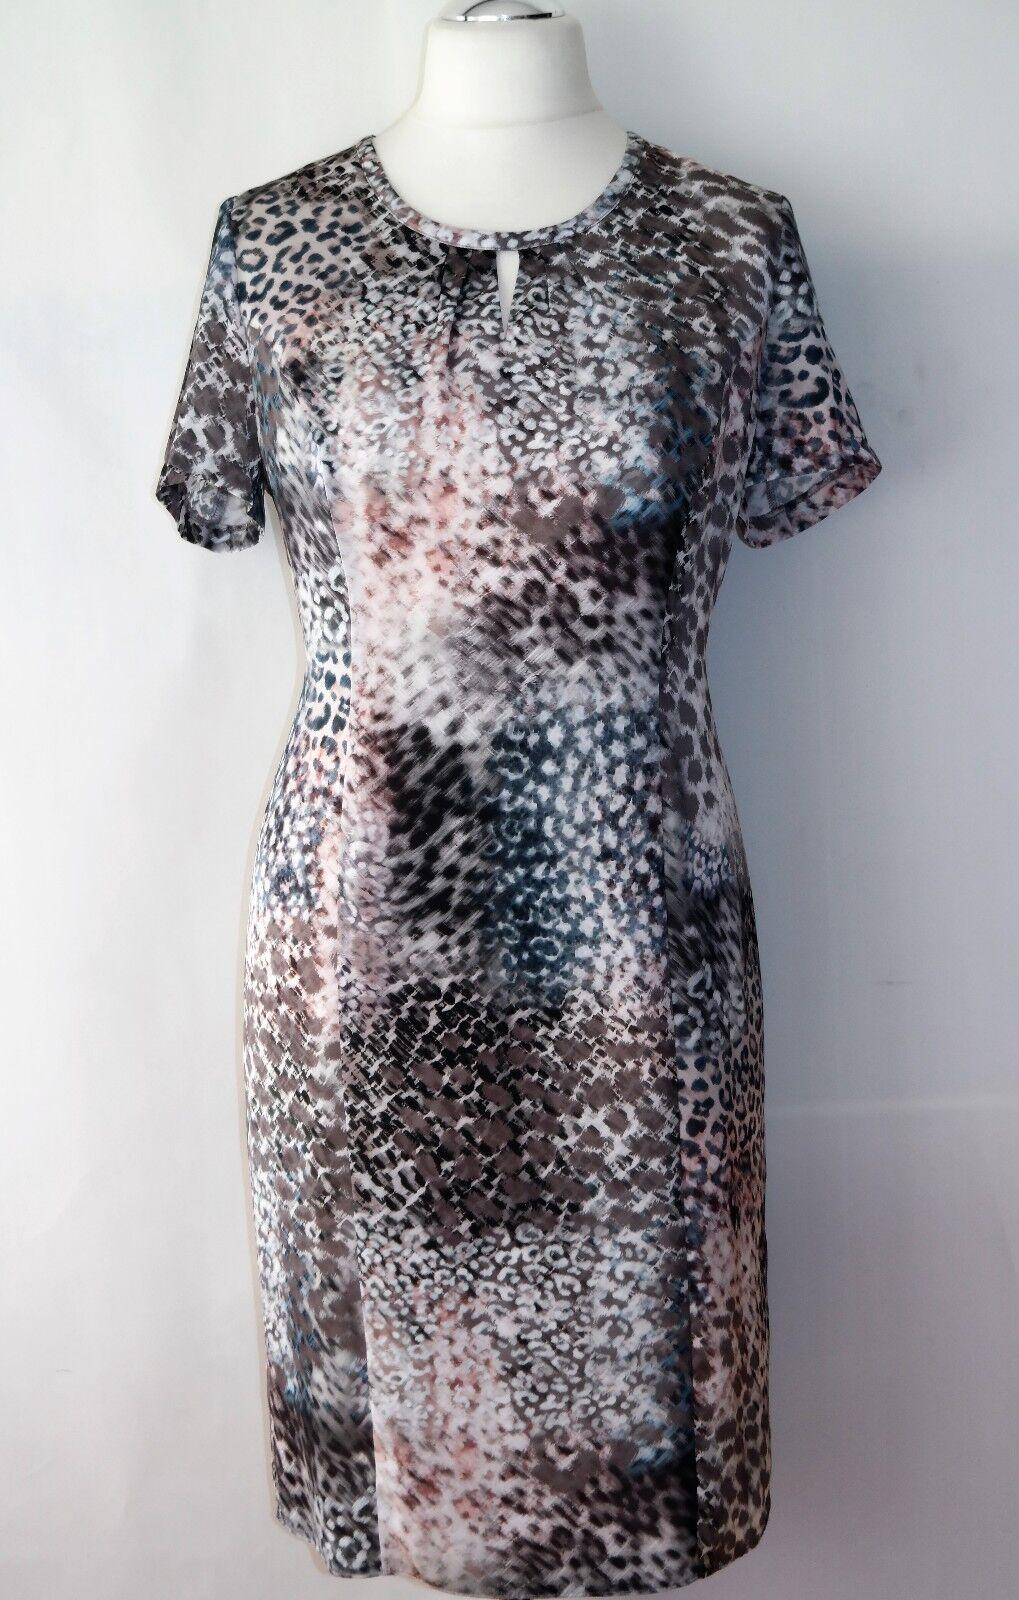 Gerry Weber Satinkleid Satinkleid Satinkleid Gr. 42 OVP  Etuikleid Damenkleid Kleid gepunktet 3d55fa